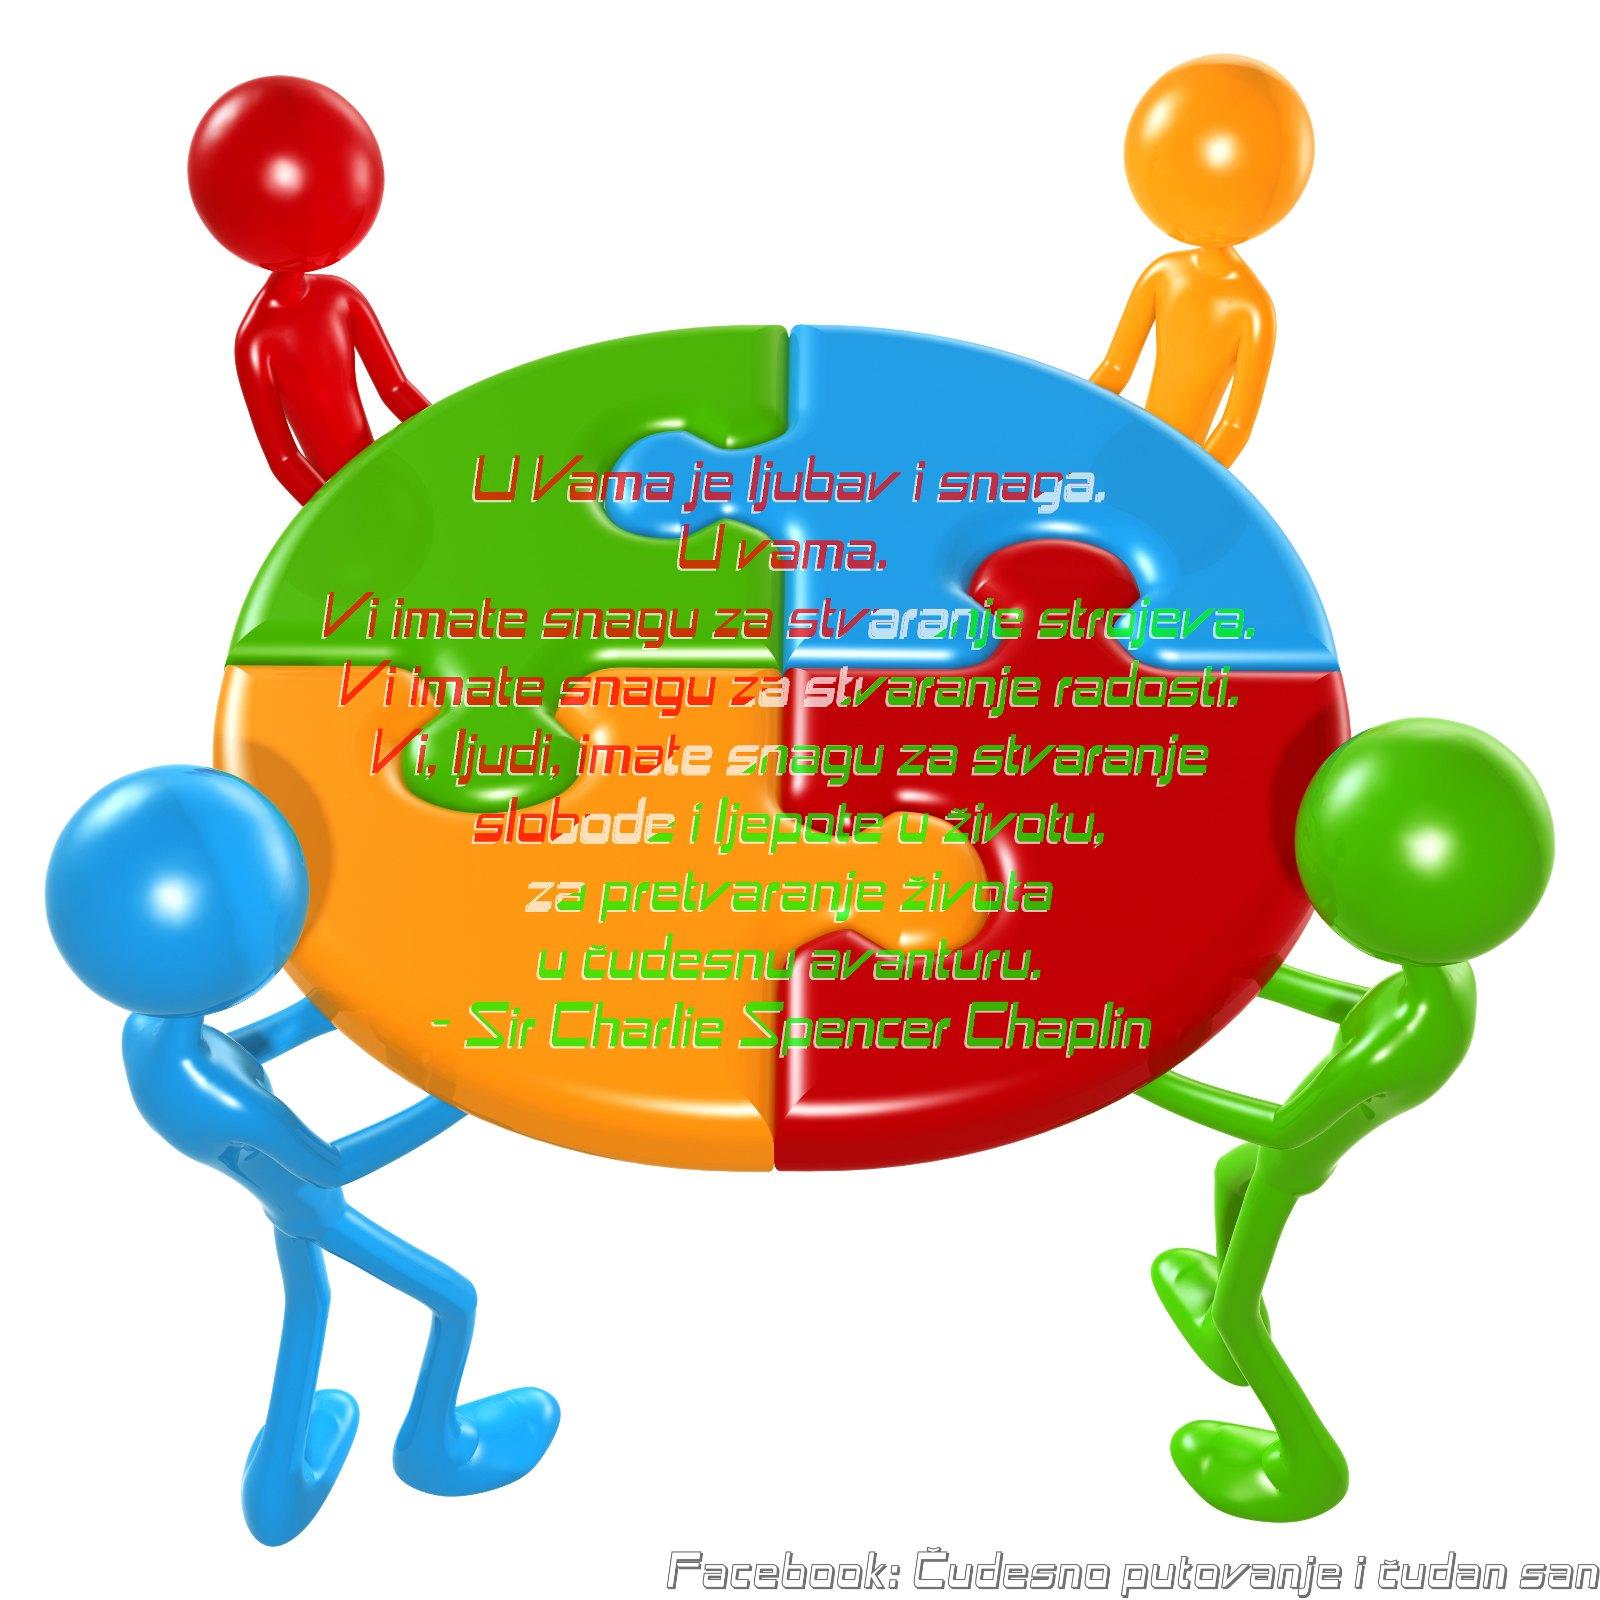 slike za rođendan za facebook Index of /za rodjendan/pozivnice za rodjendan za printanje slike za rođendan za facebook